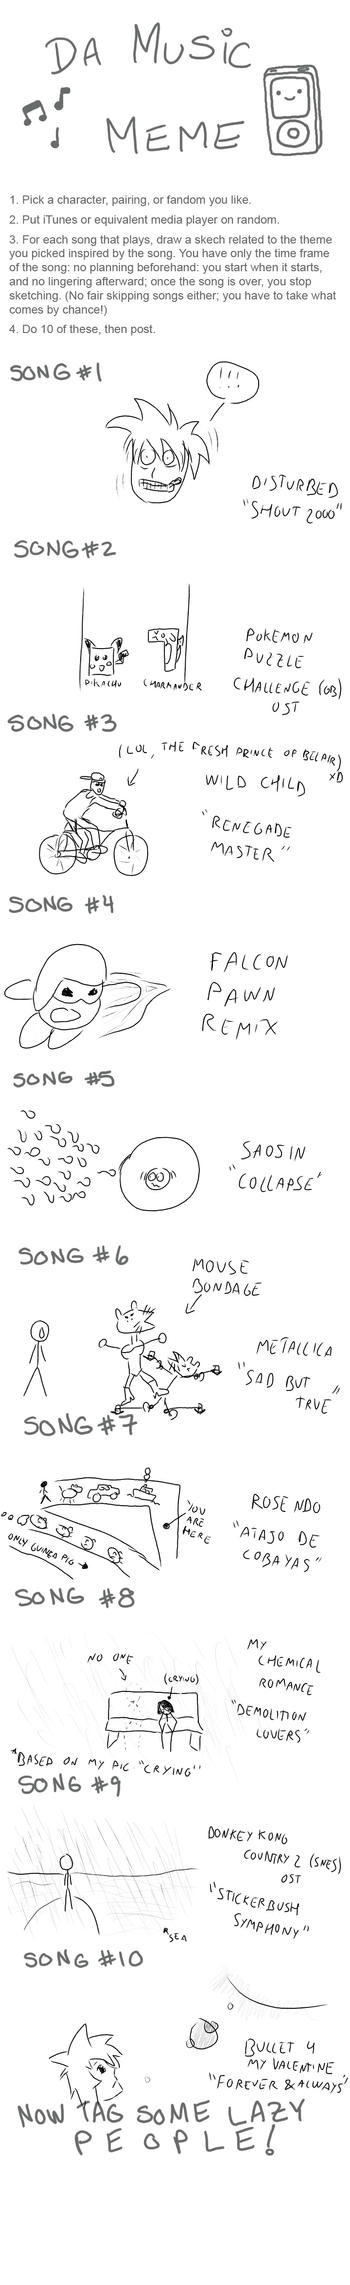 Music Meme preowned by zeldaneko